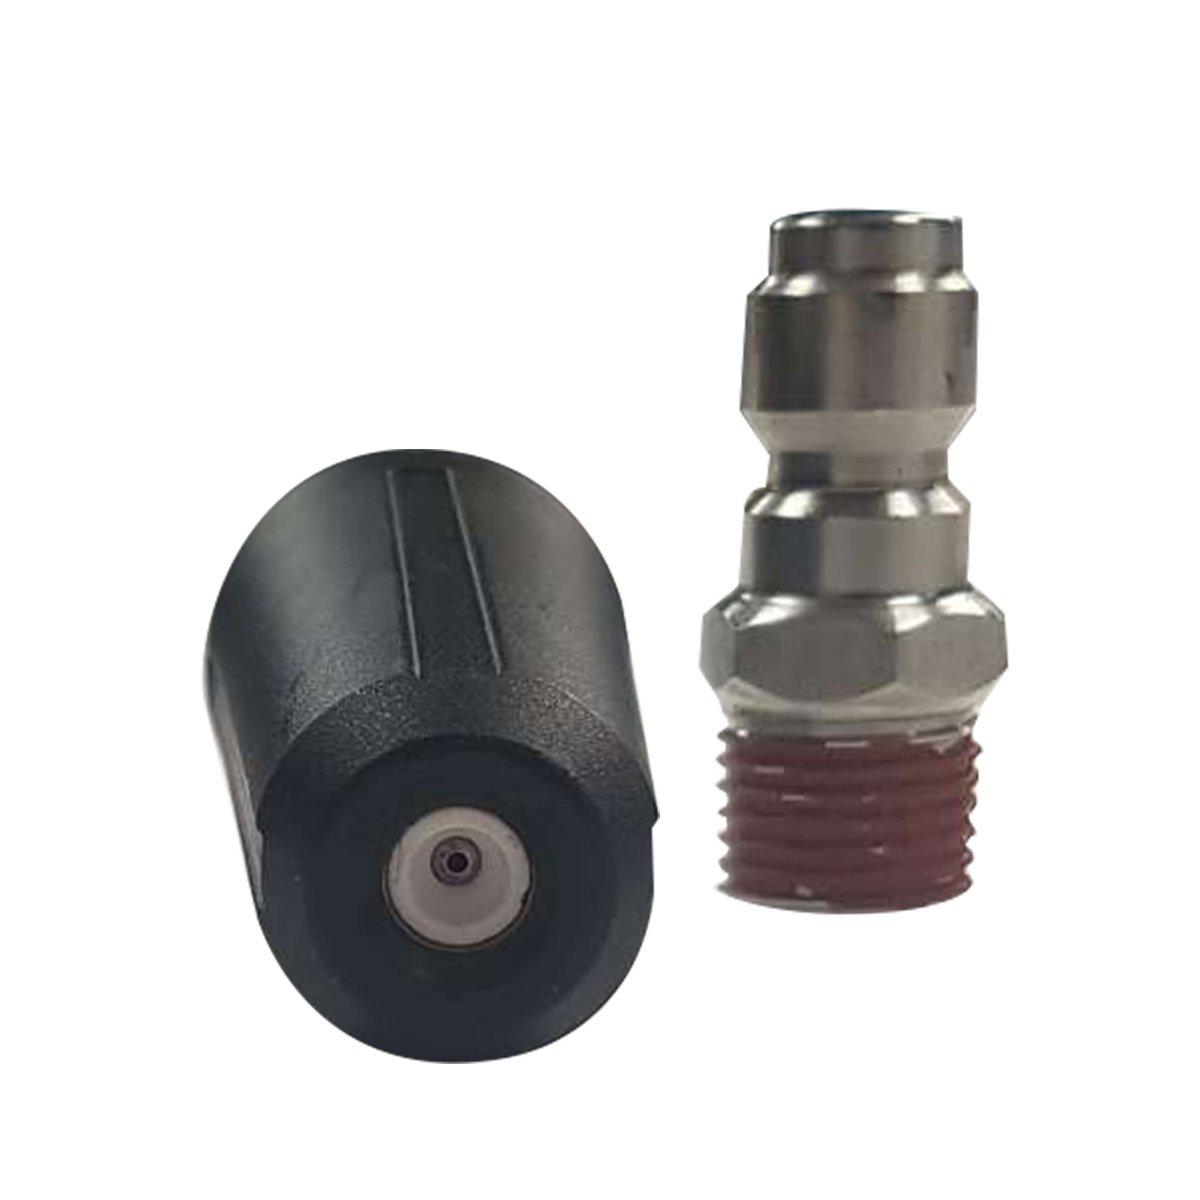 Ducar Water Pressure Turbo Rotary Head Nozzle